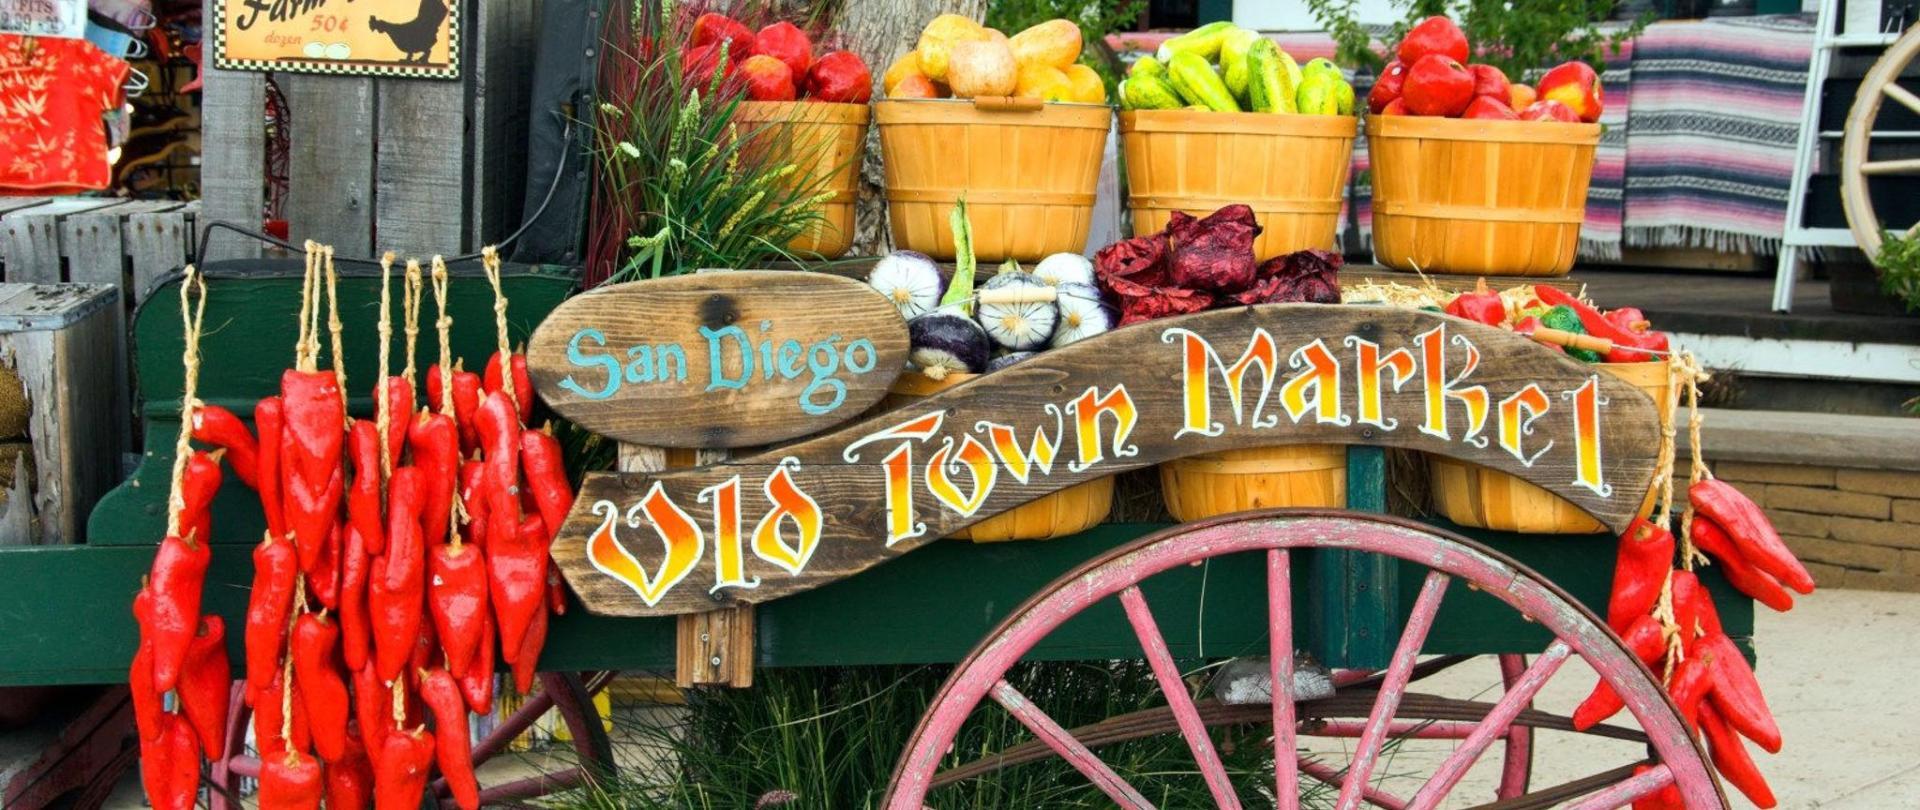 old-town-farmers-market.jpg